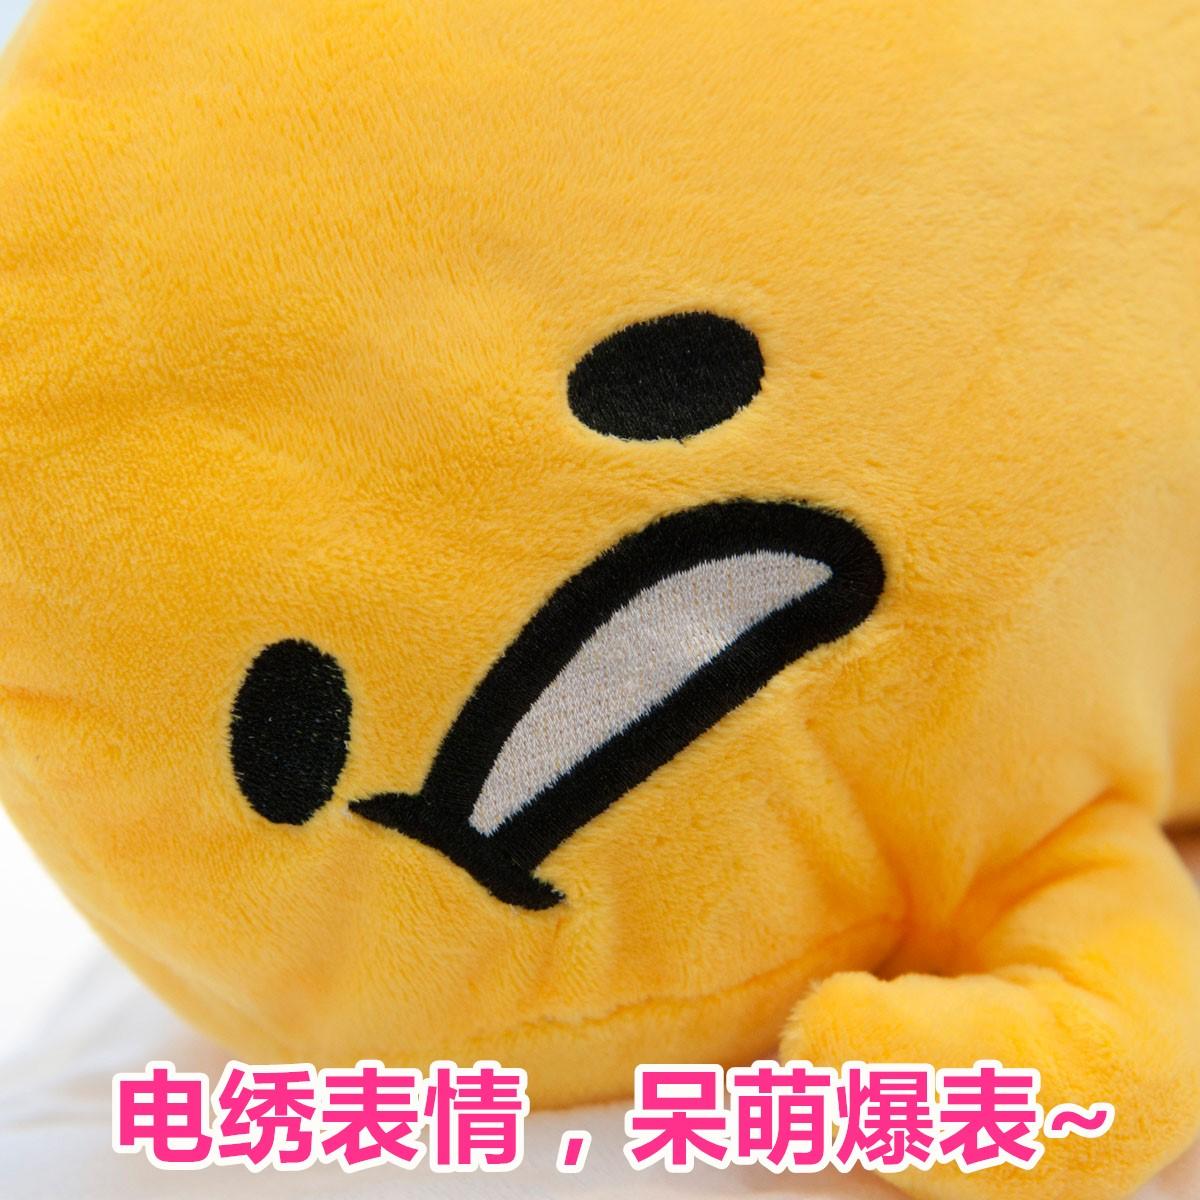 Мягкая игрушка Lazy egg yolk  Gudetama